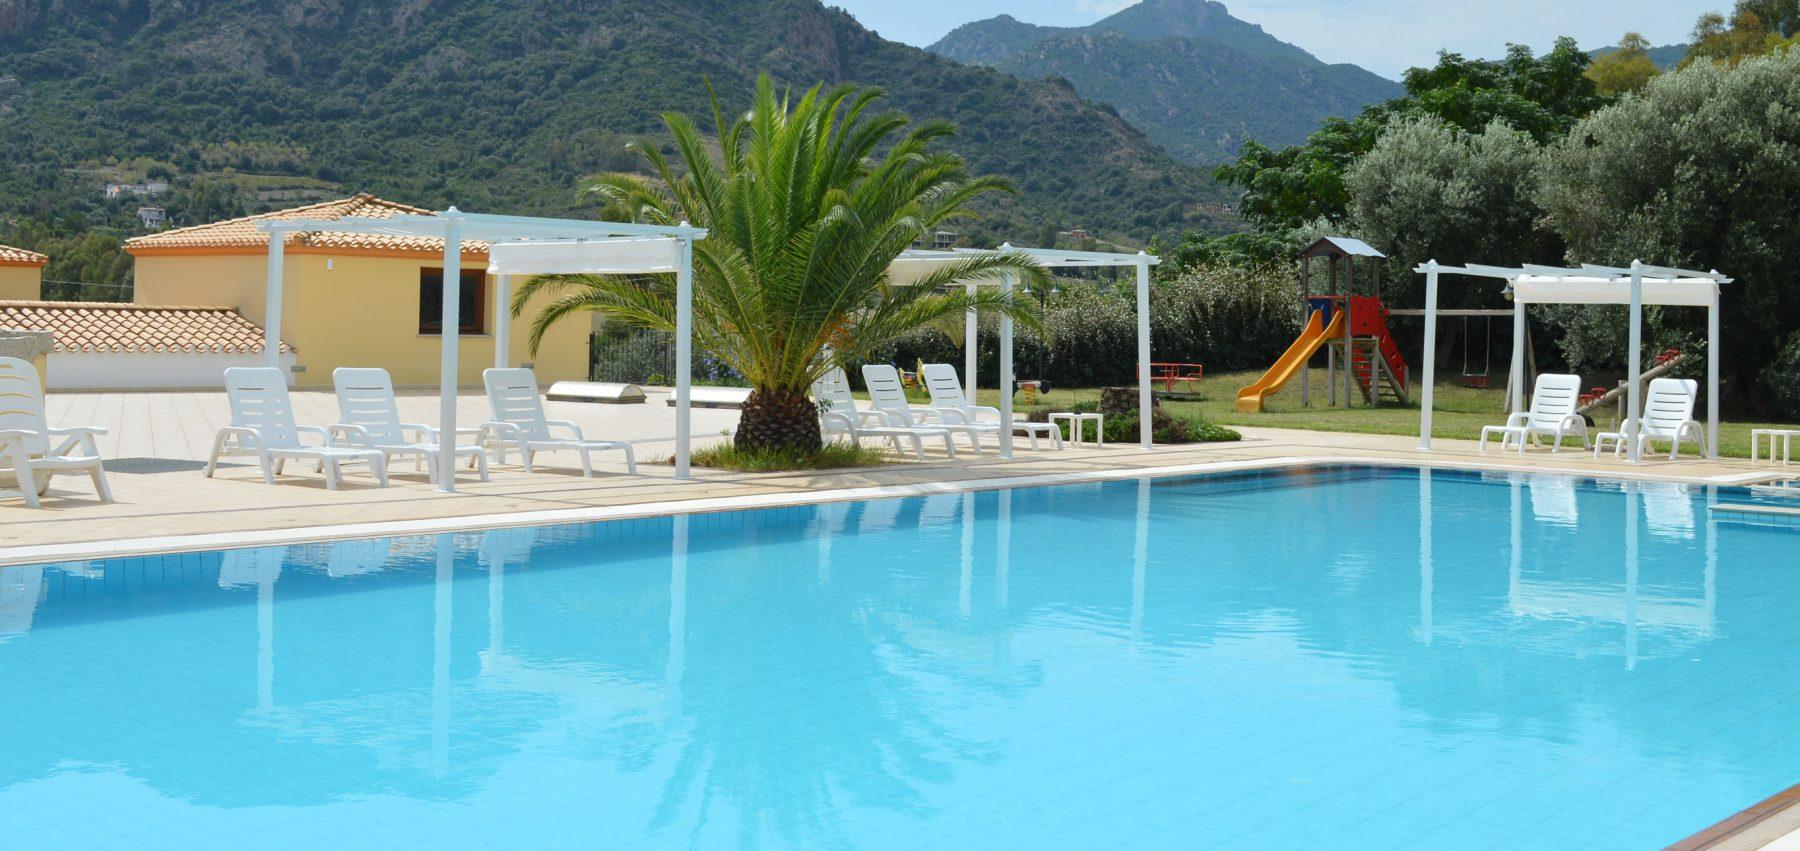 hotel-cardedu-ogliastra-sardegna-la-piscina4